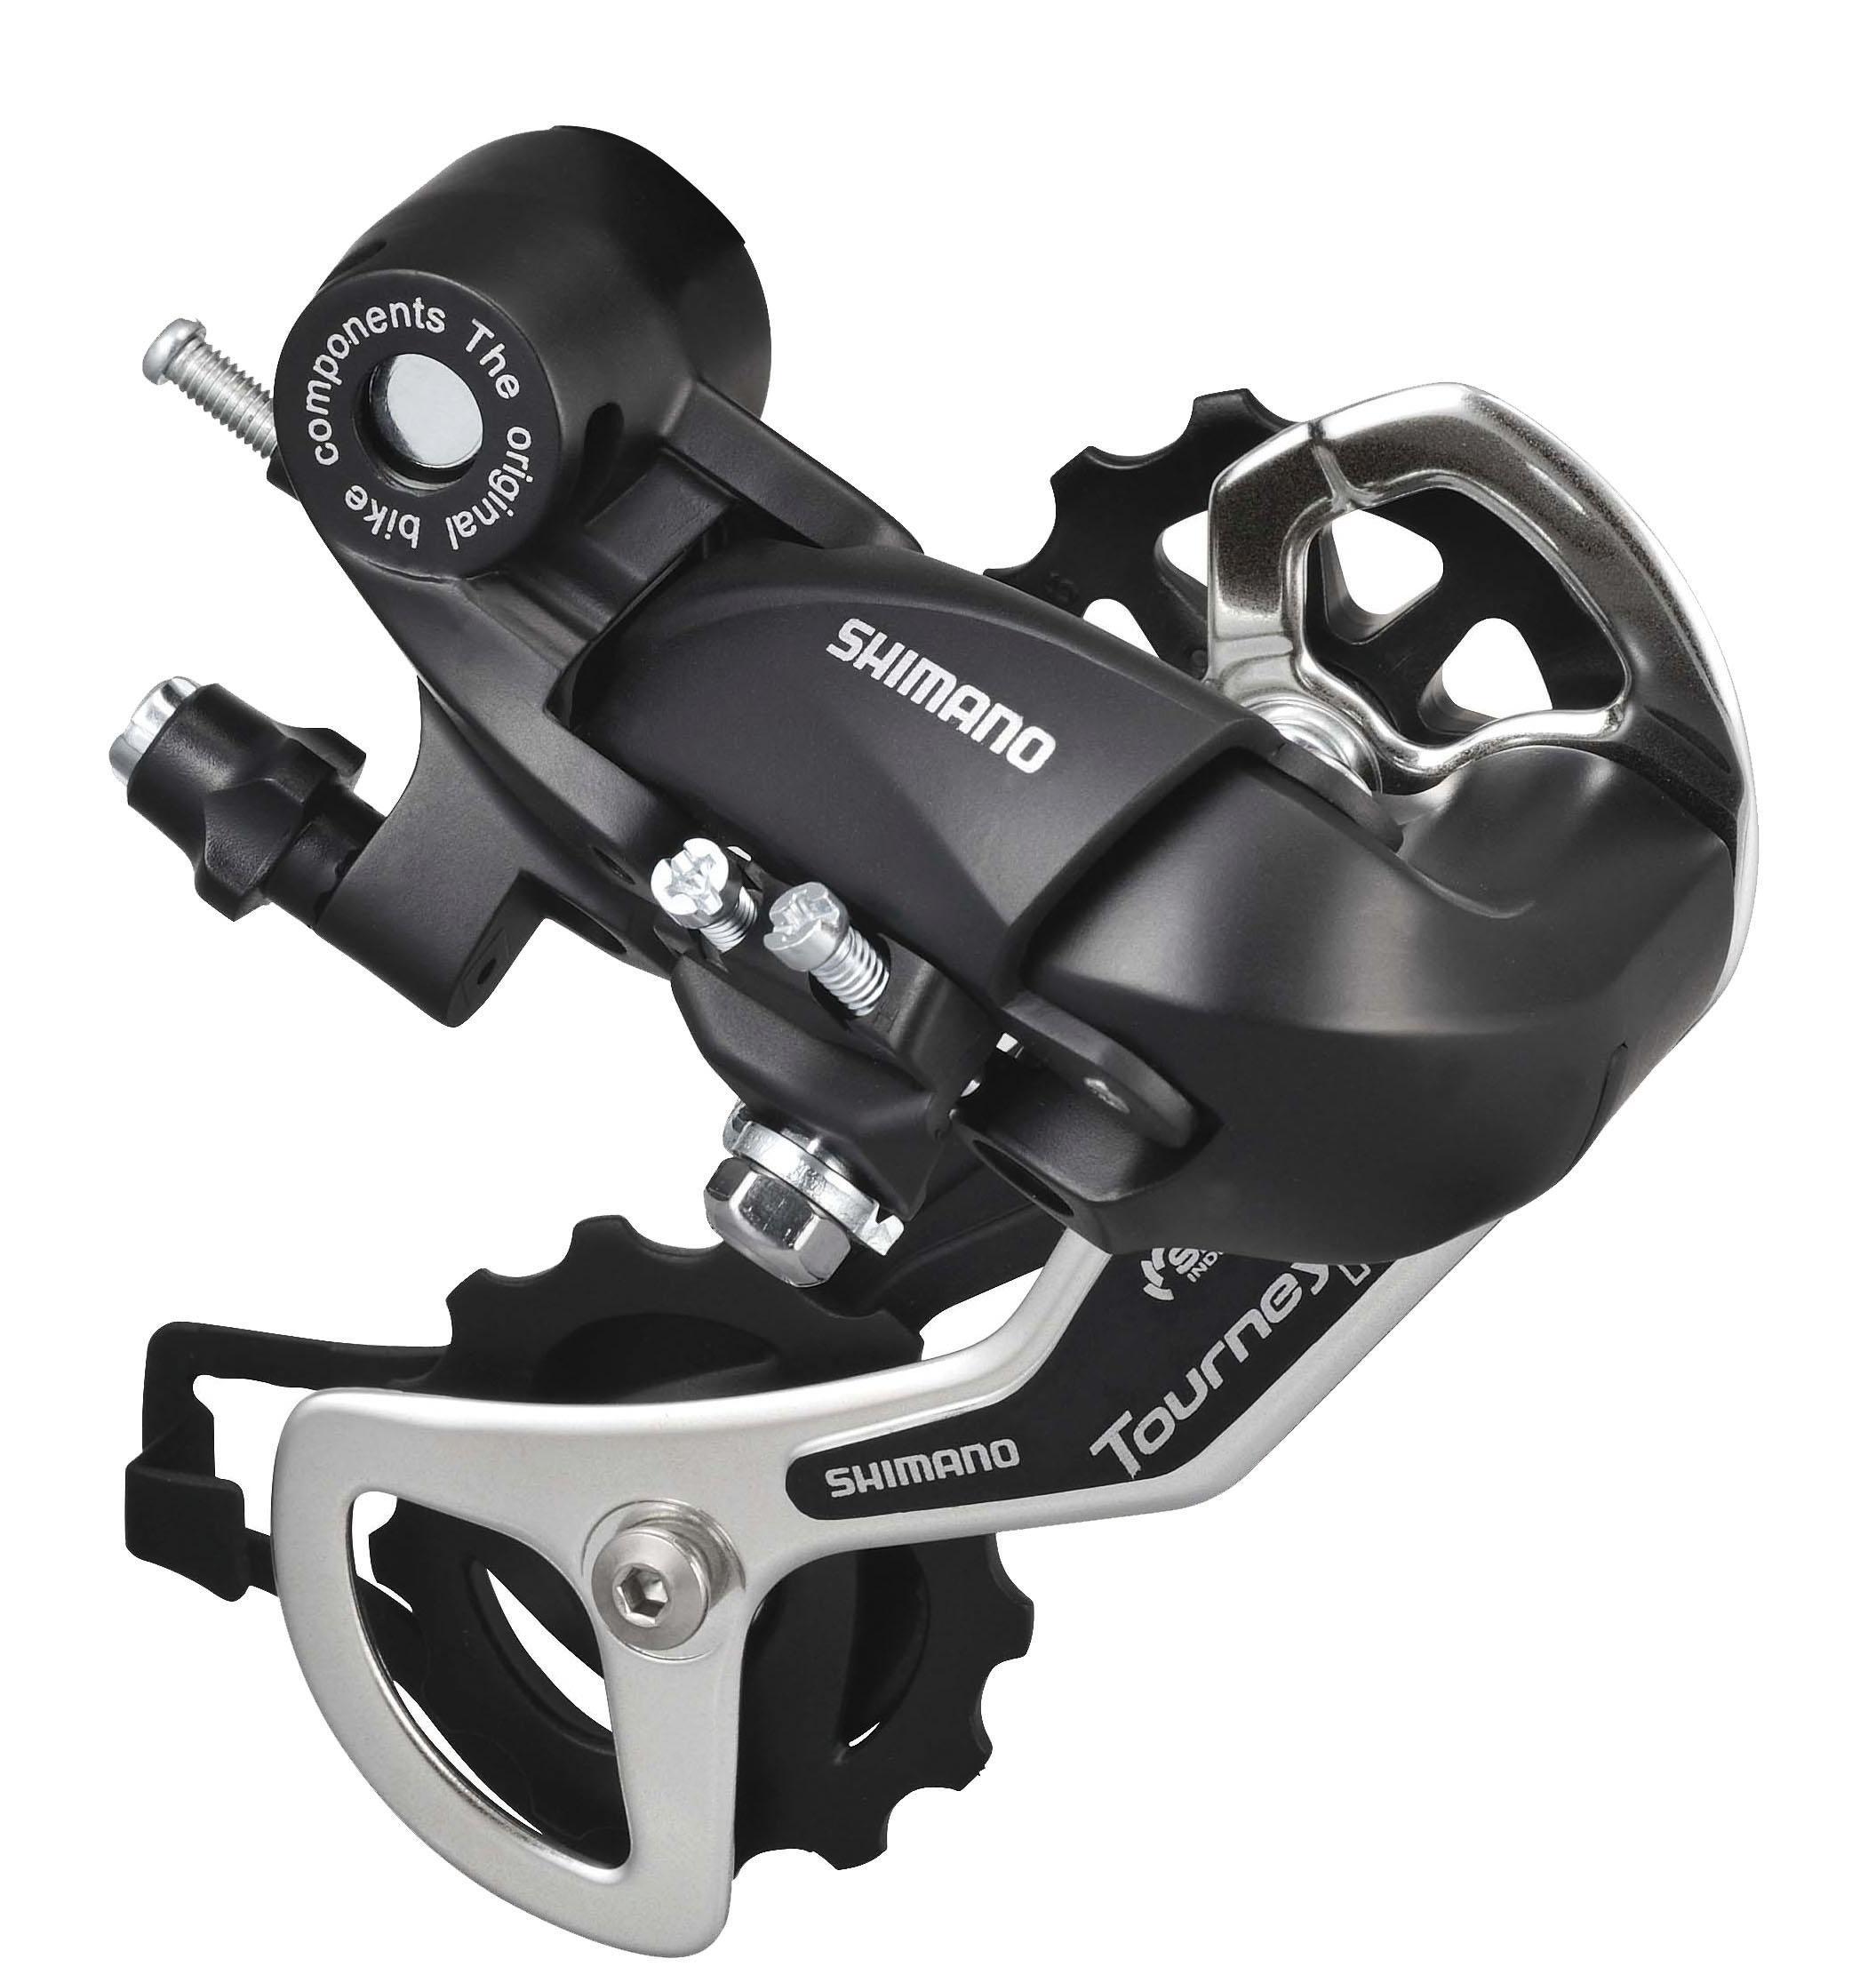 Shimano RD-TX35 7-speed Rear Deraileur